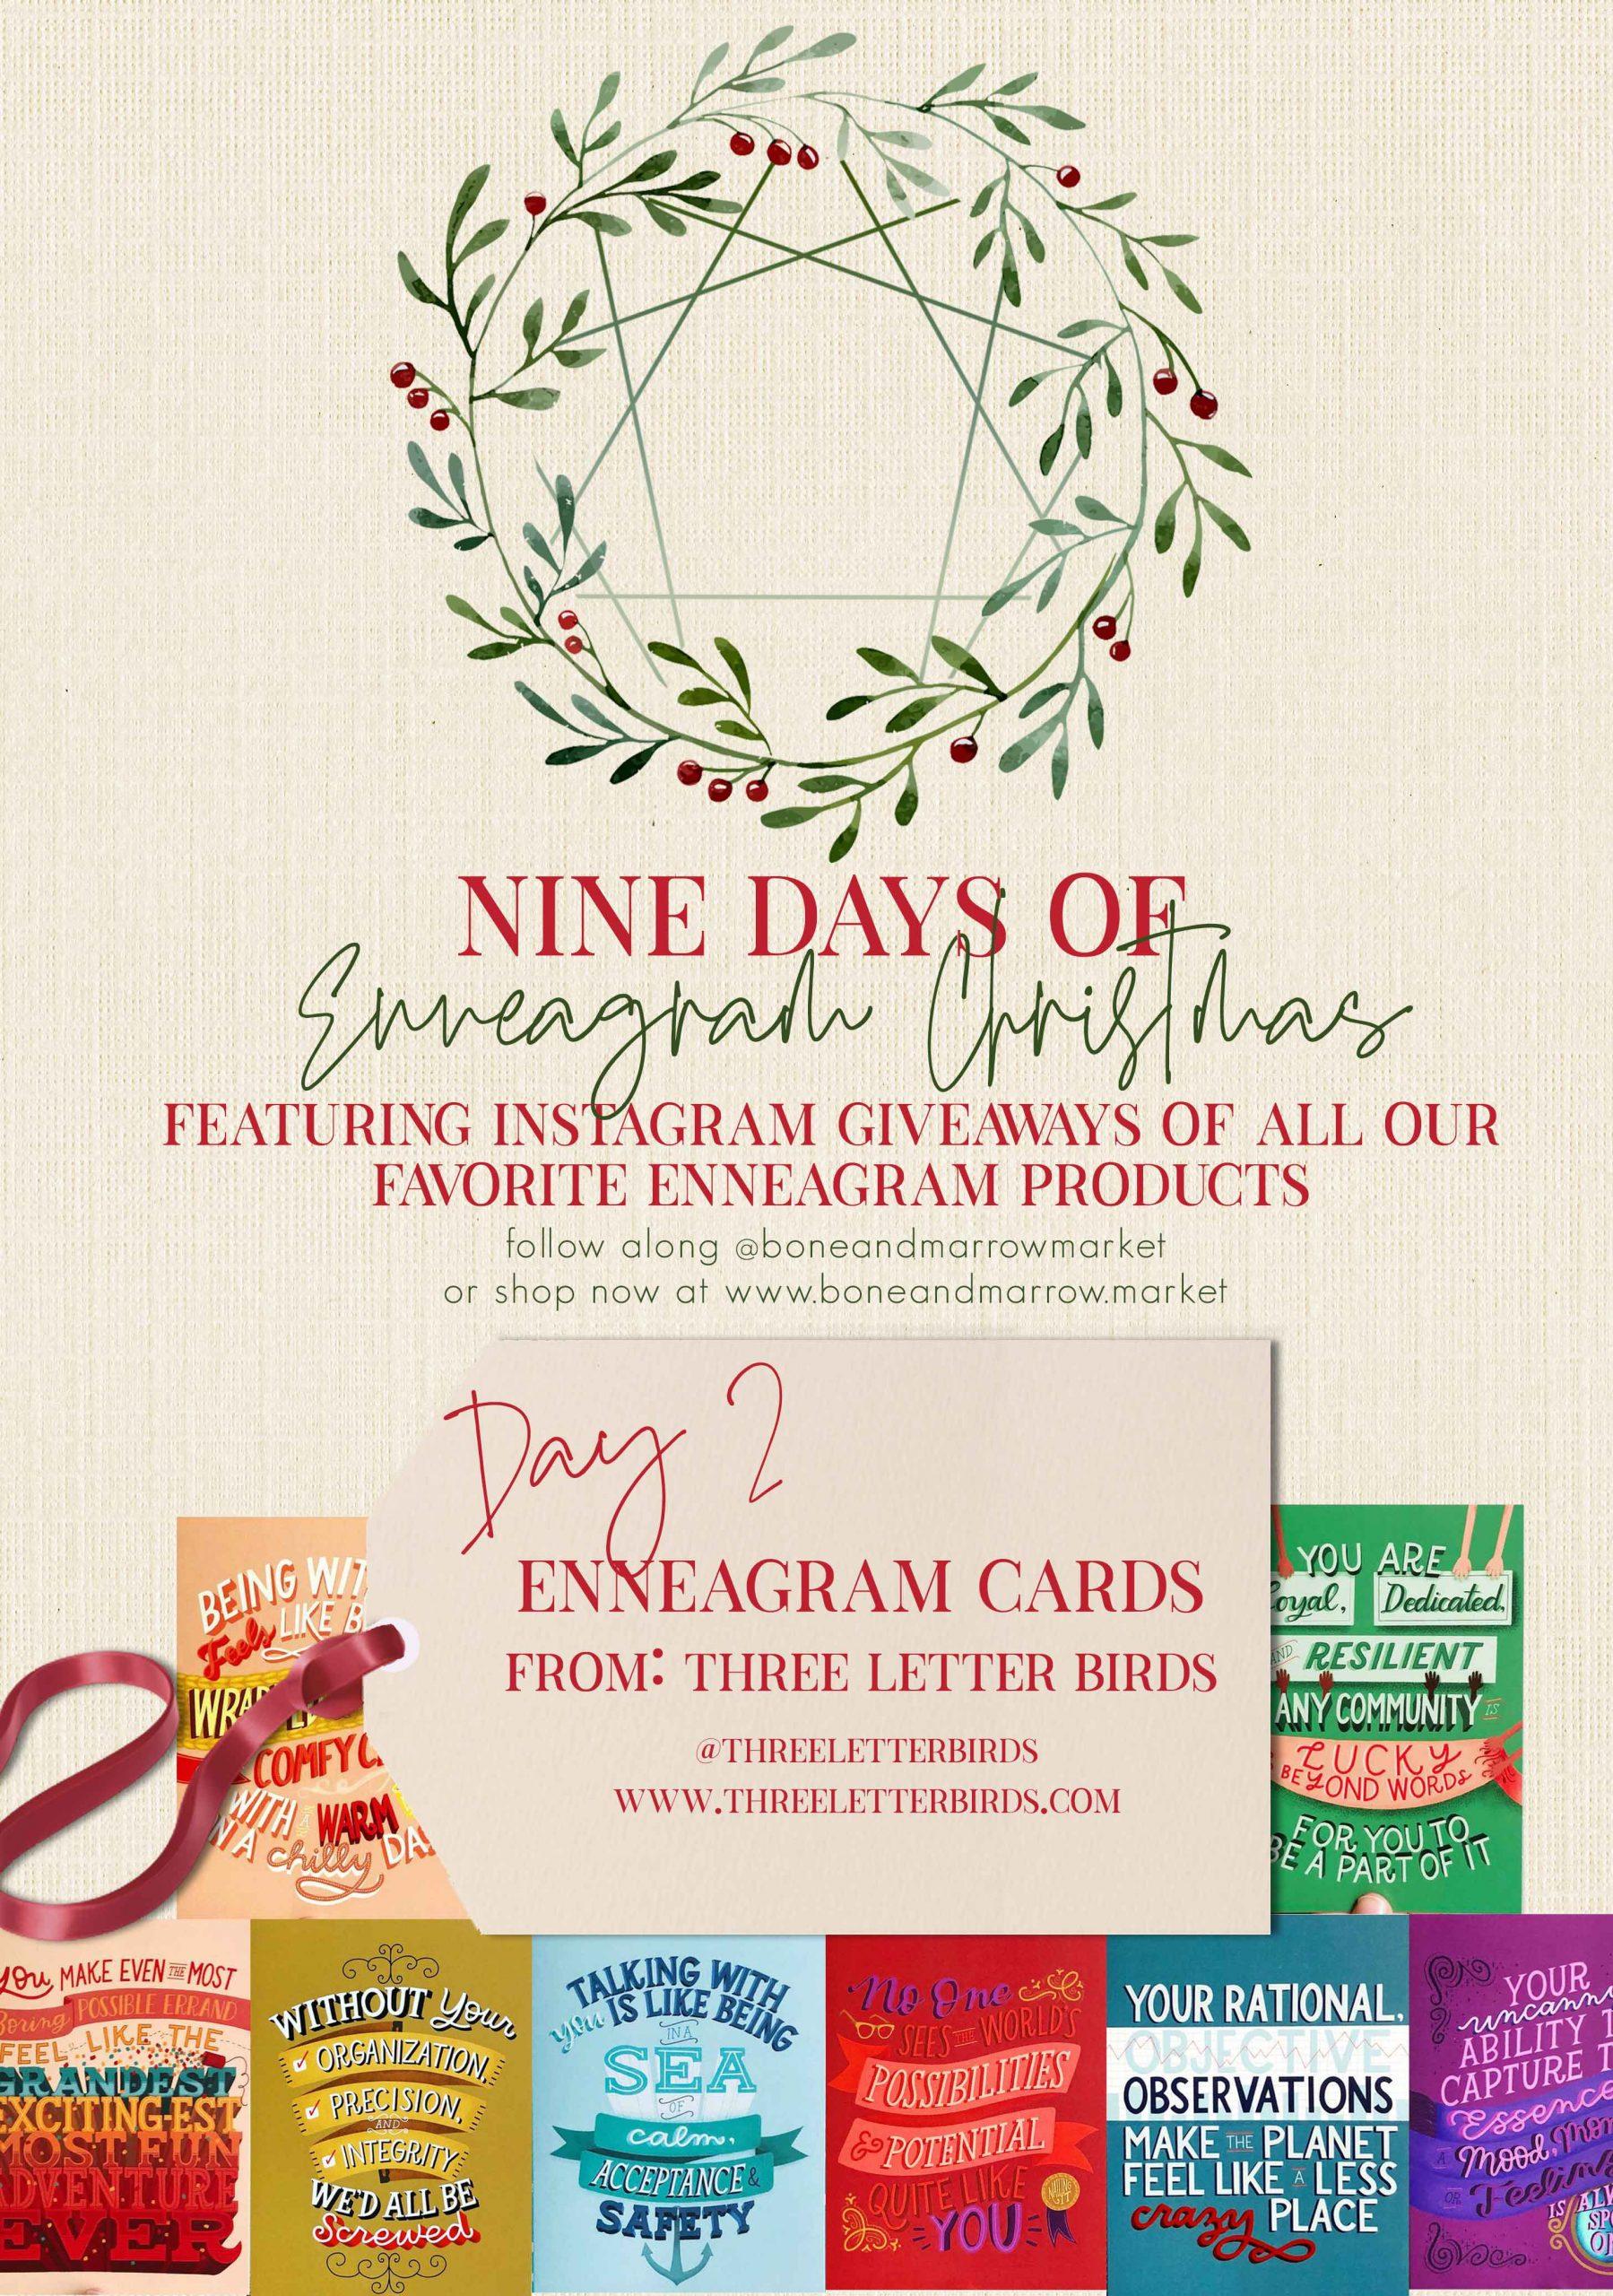 Enneagram Cards by Three Letter Birds   9 Days of Enneagram Christmas